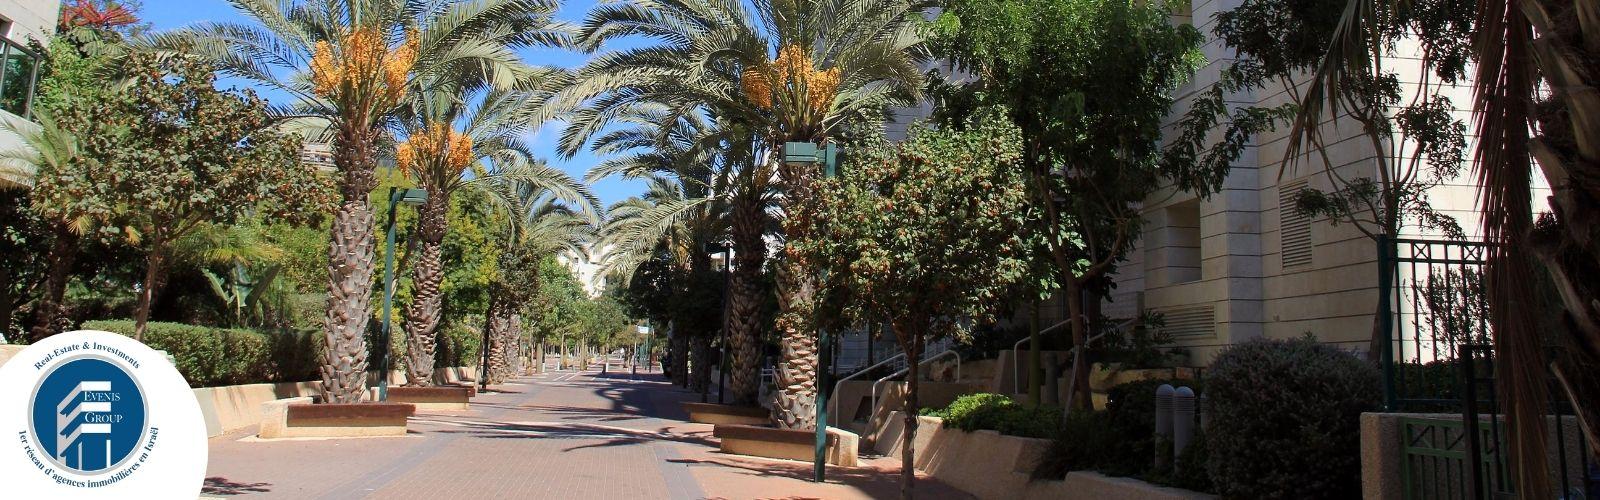 IMMOBILIER A ramat aviv EN ISRAEL 2021